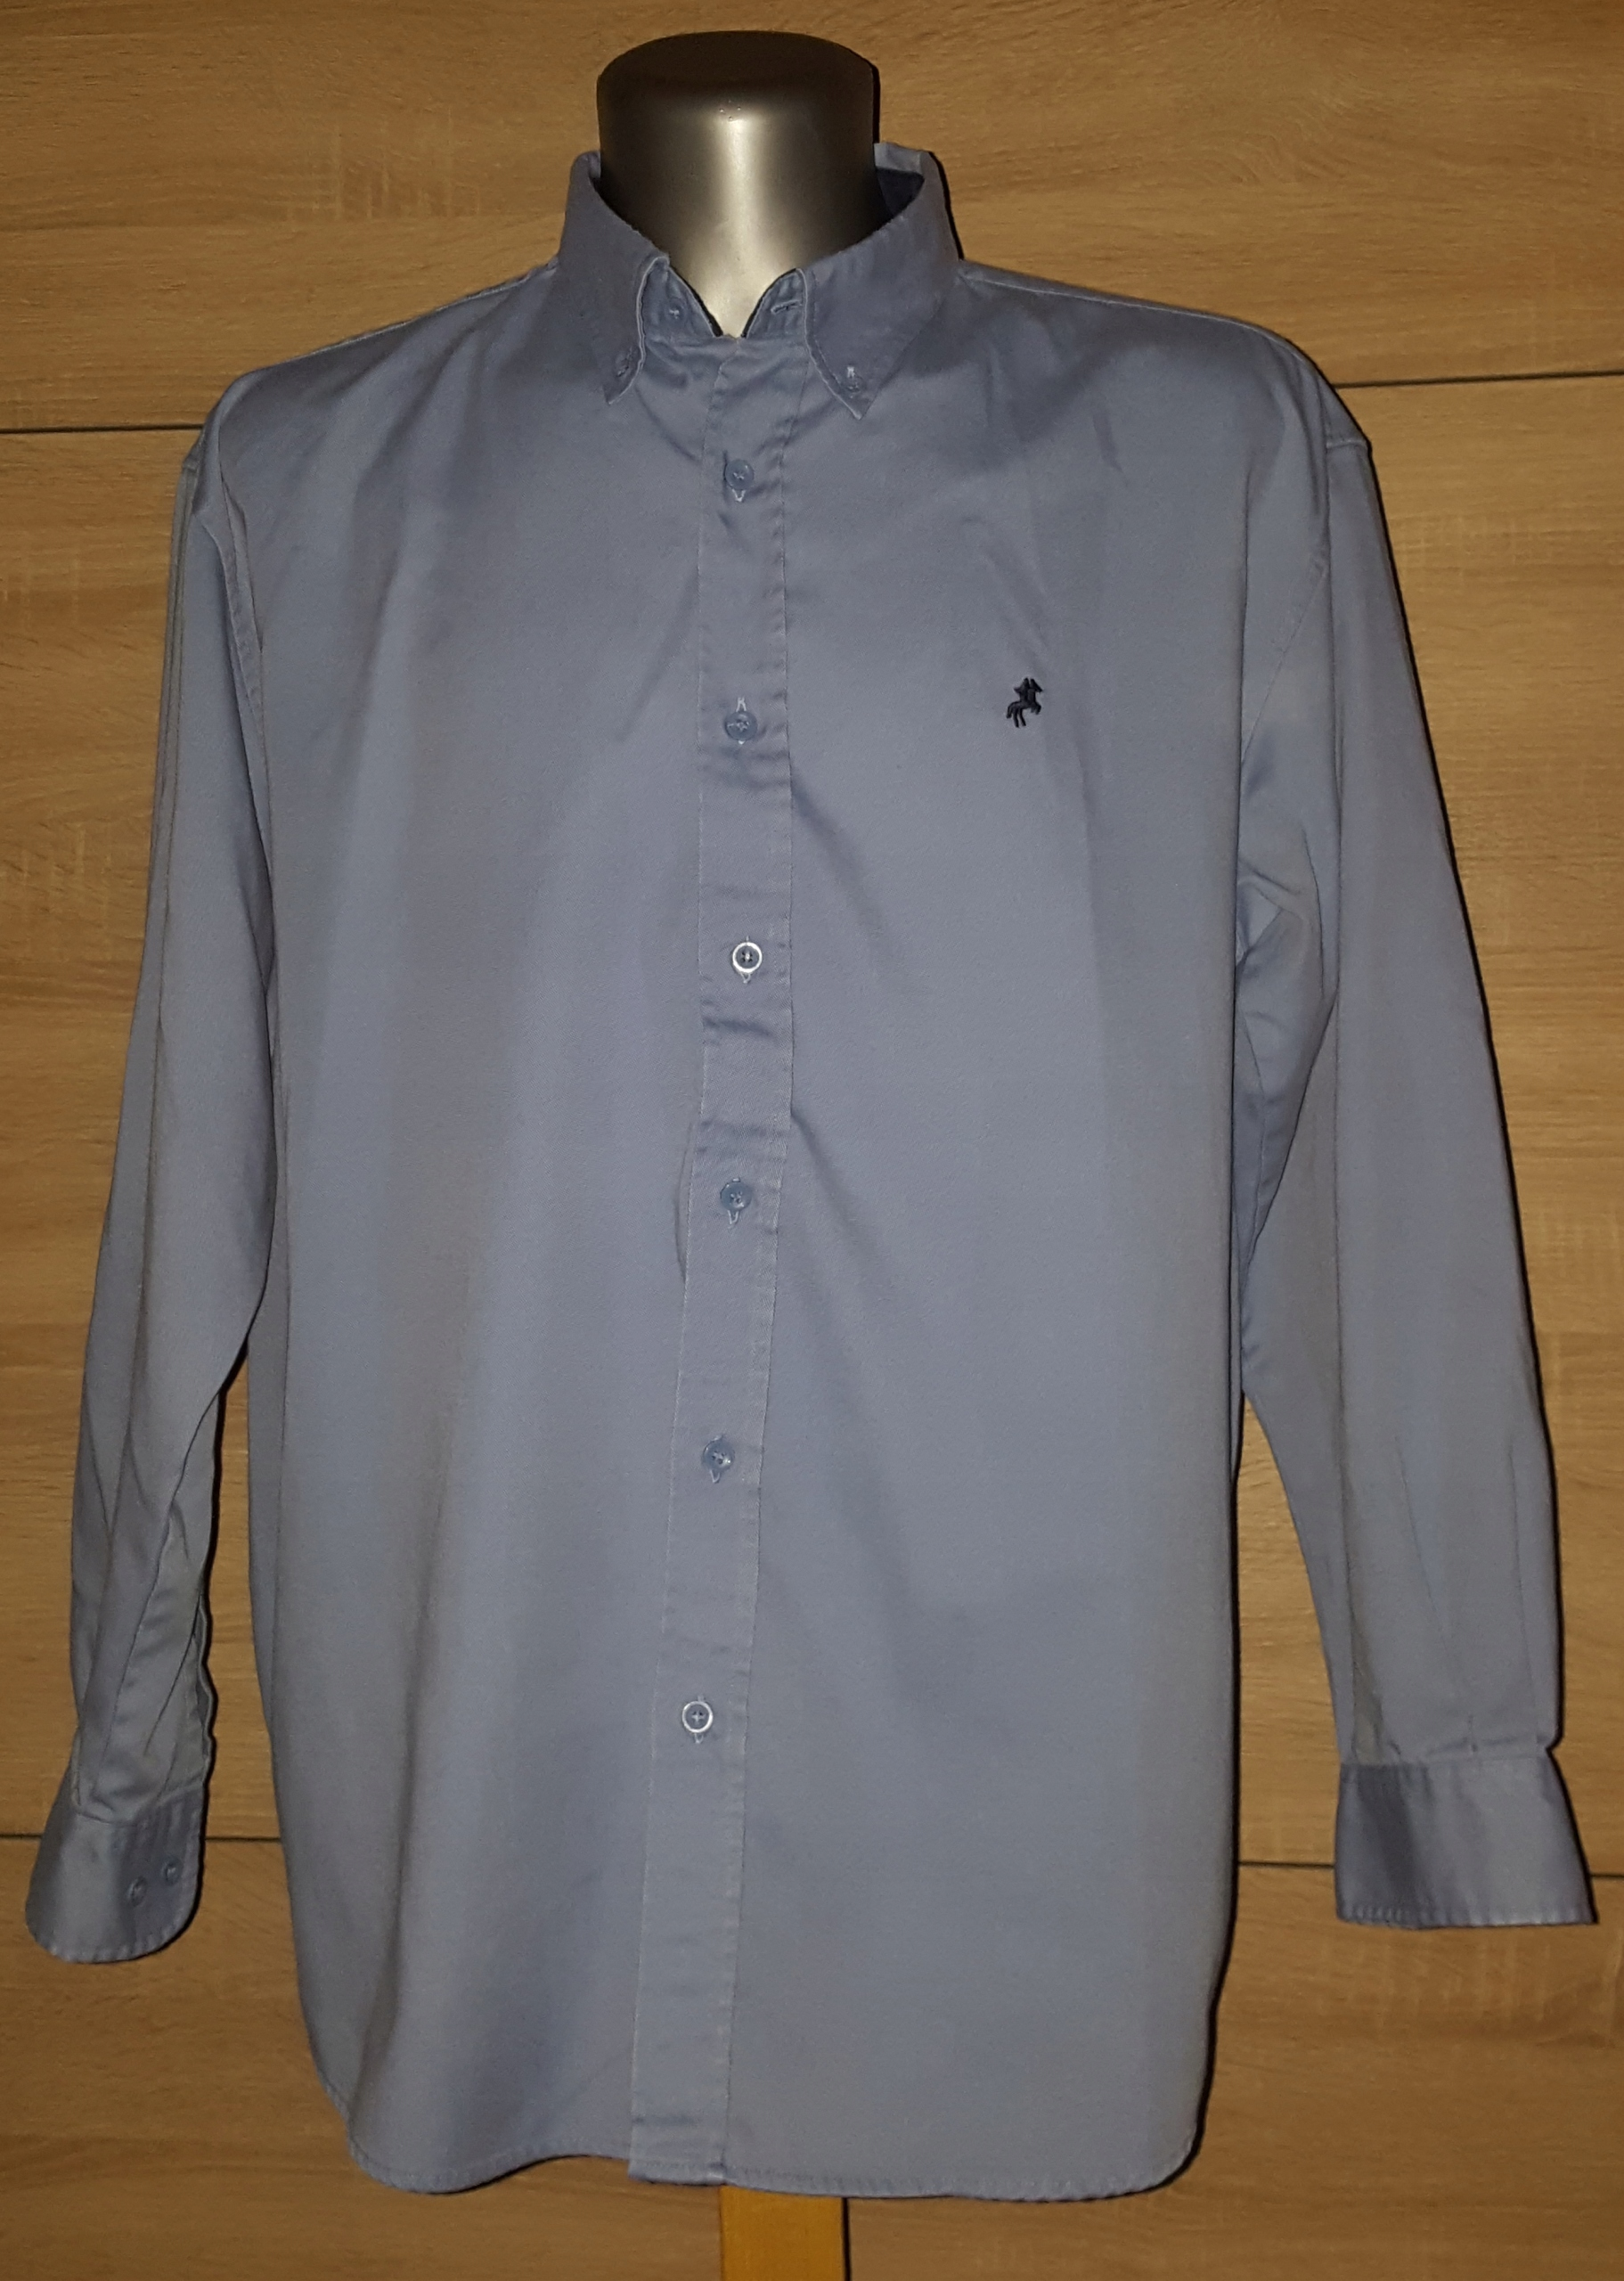 Koszula męska NORTHWOOD rozmiar L.